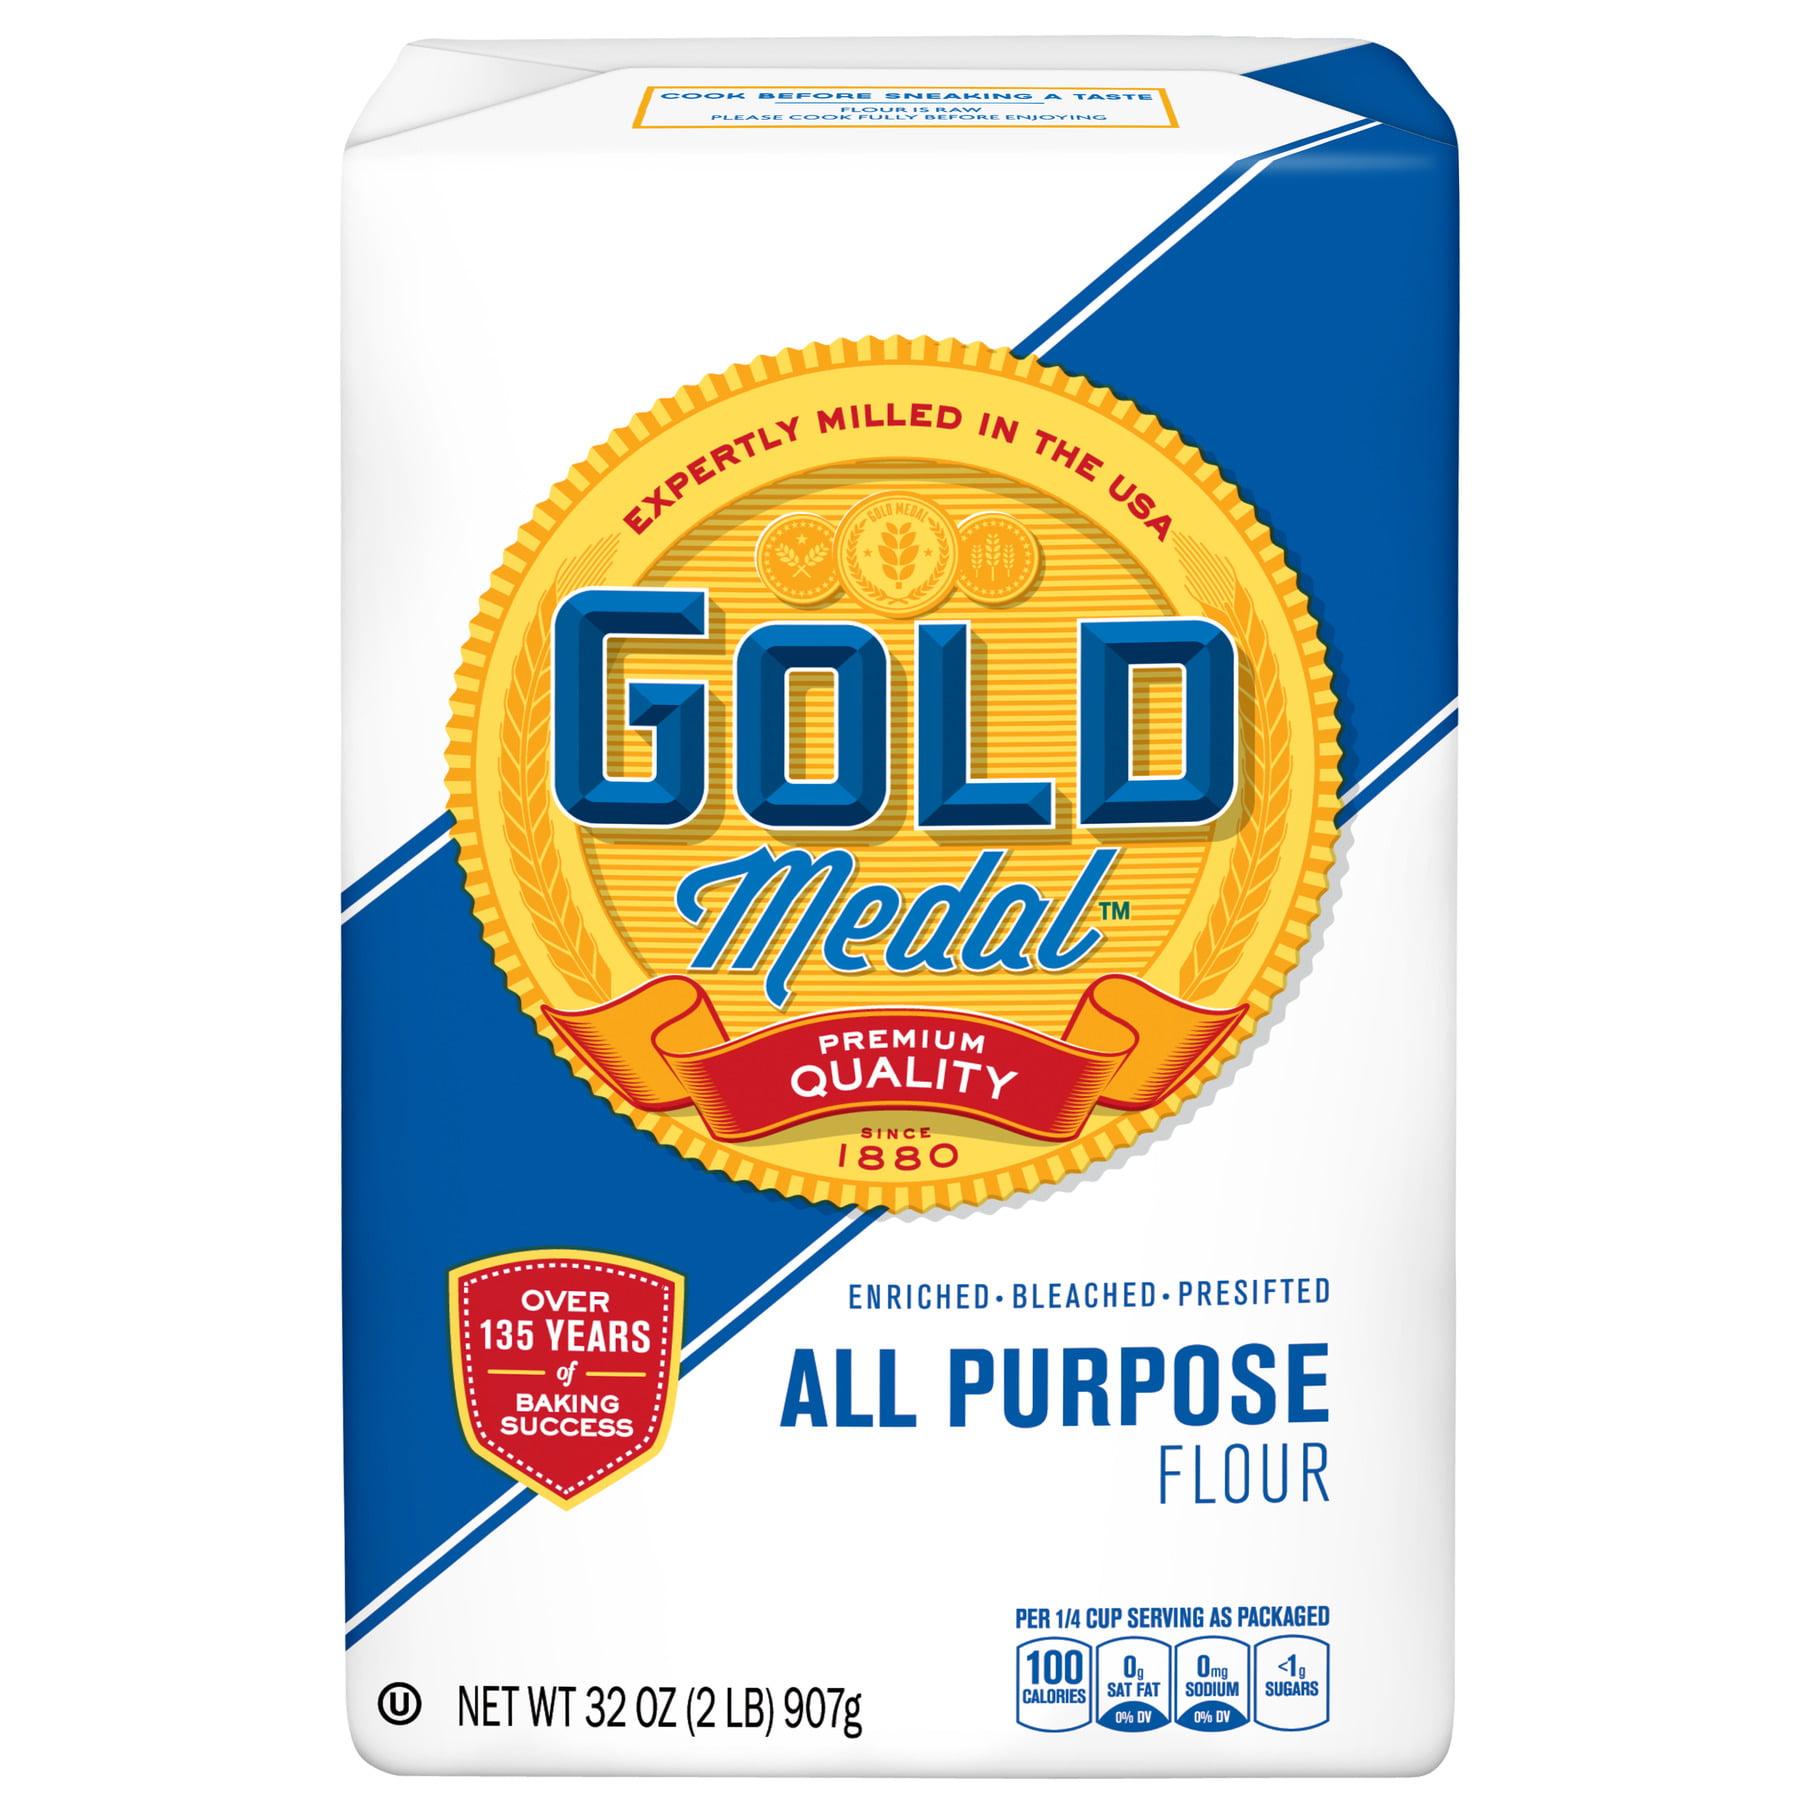 Gold Medal All-Purpose Flour, 2 lb Bag